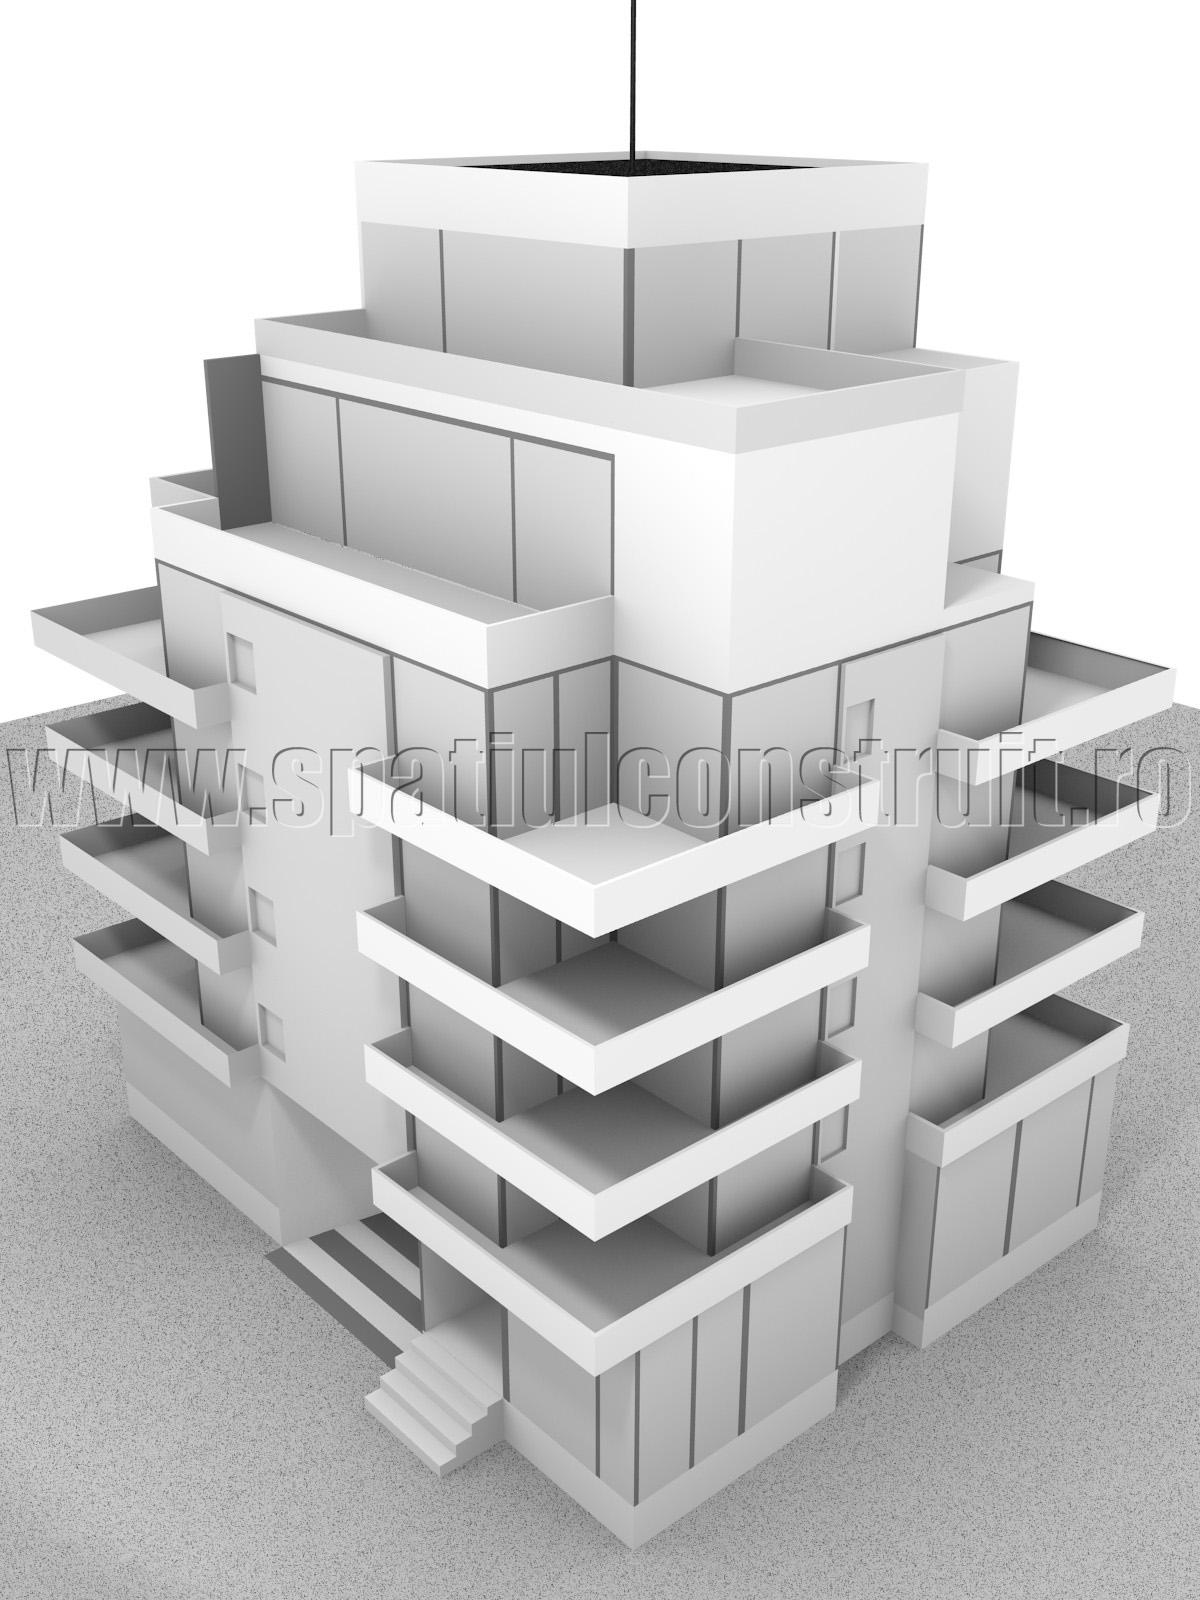 Bloc cu cinci niveluri - Locuinte cu putine niveluri